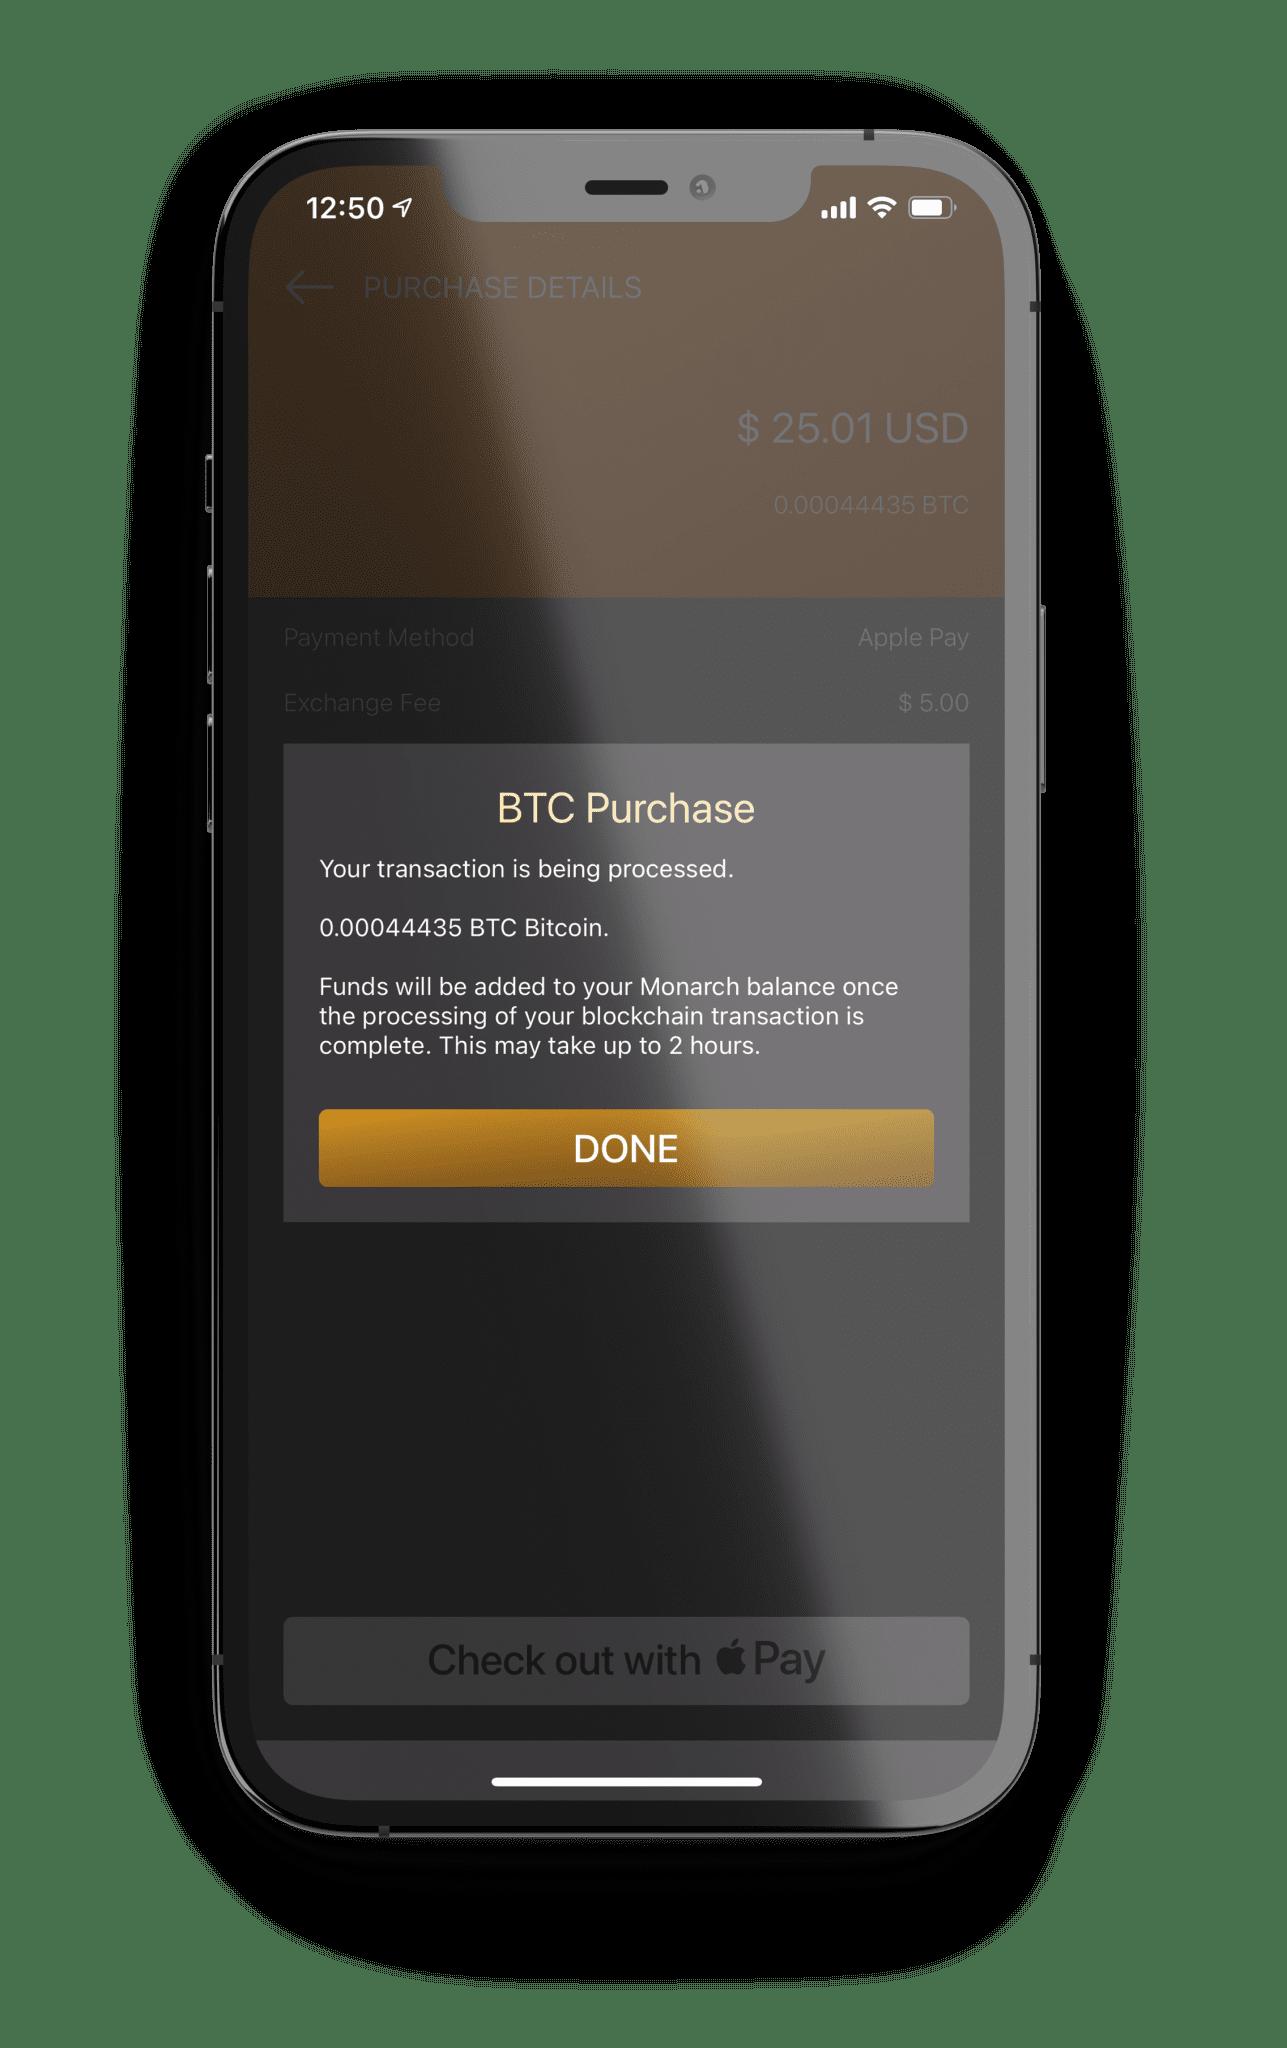 Monarch Wallet Final BTC Purchase Confirmation